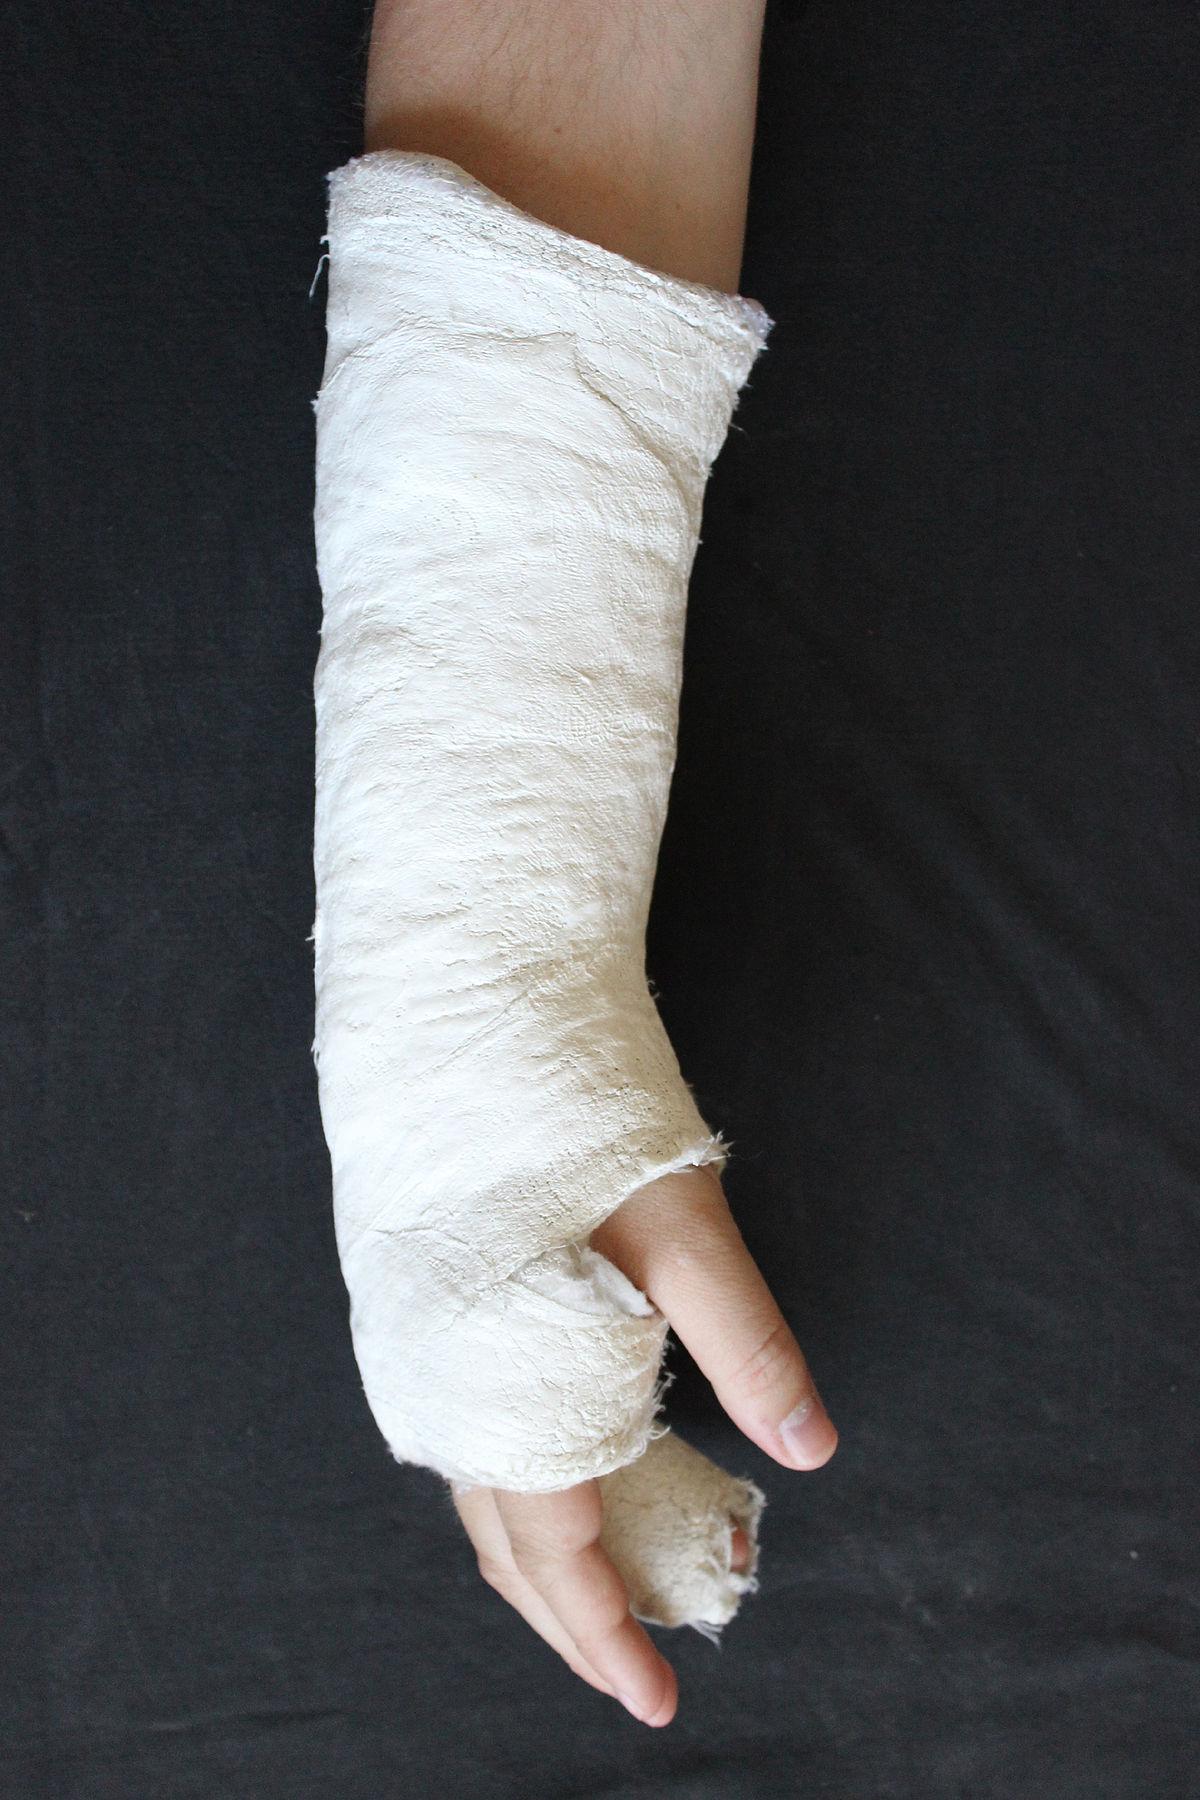 кисло-сладкий картинки про перелом руки черном золоте купаясь